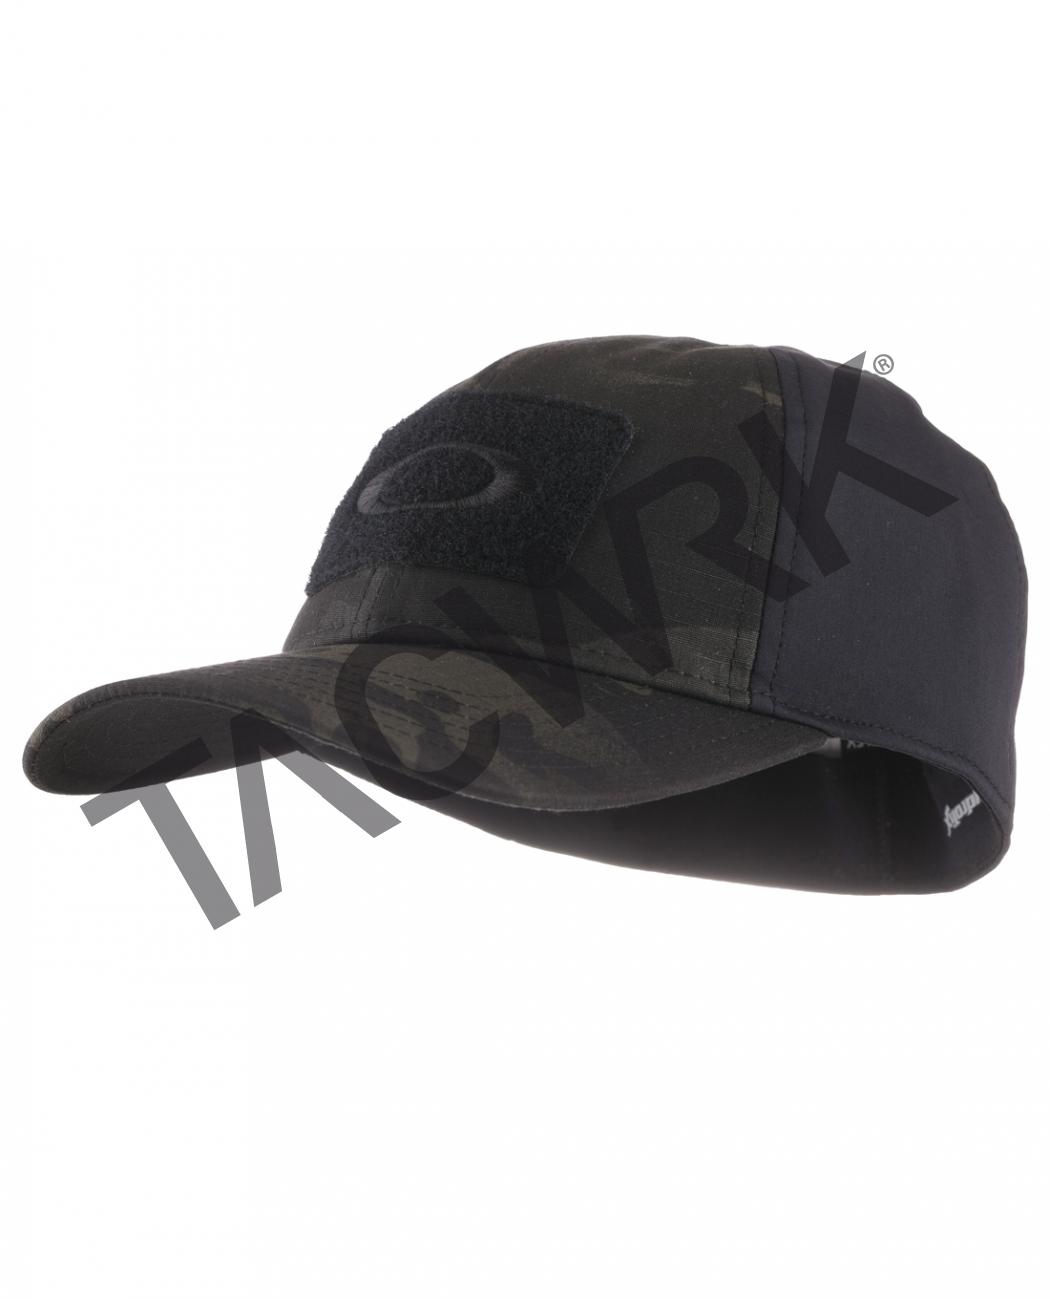 754a8f627fc0a ... inexpensive oakley si cotton cap multicam black tacwrk 59c8d 1af19